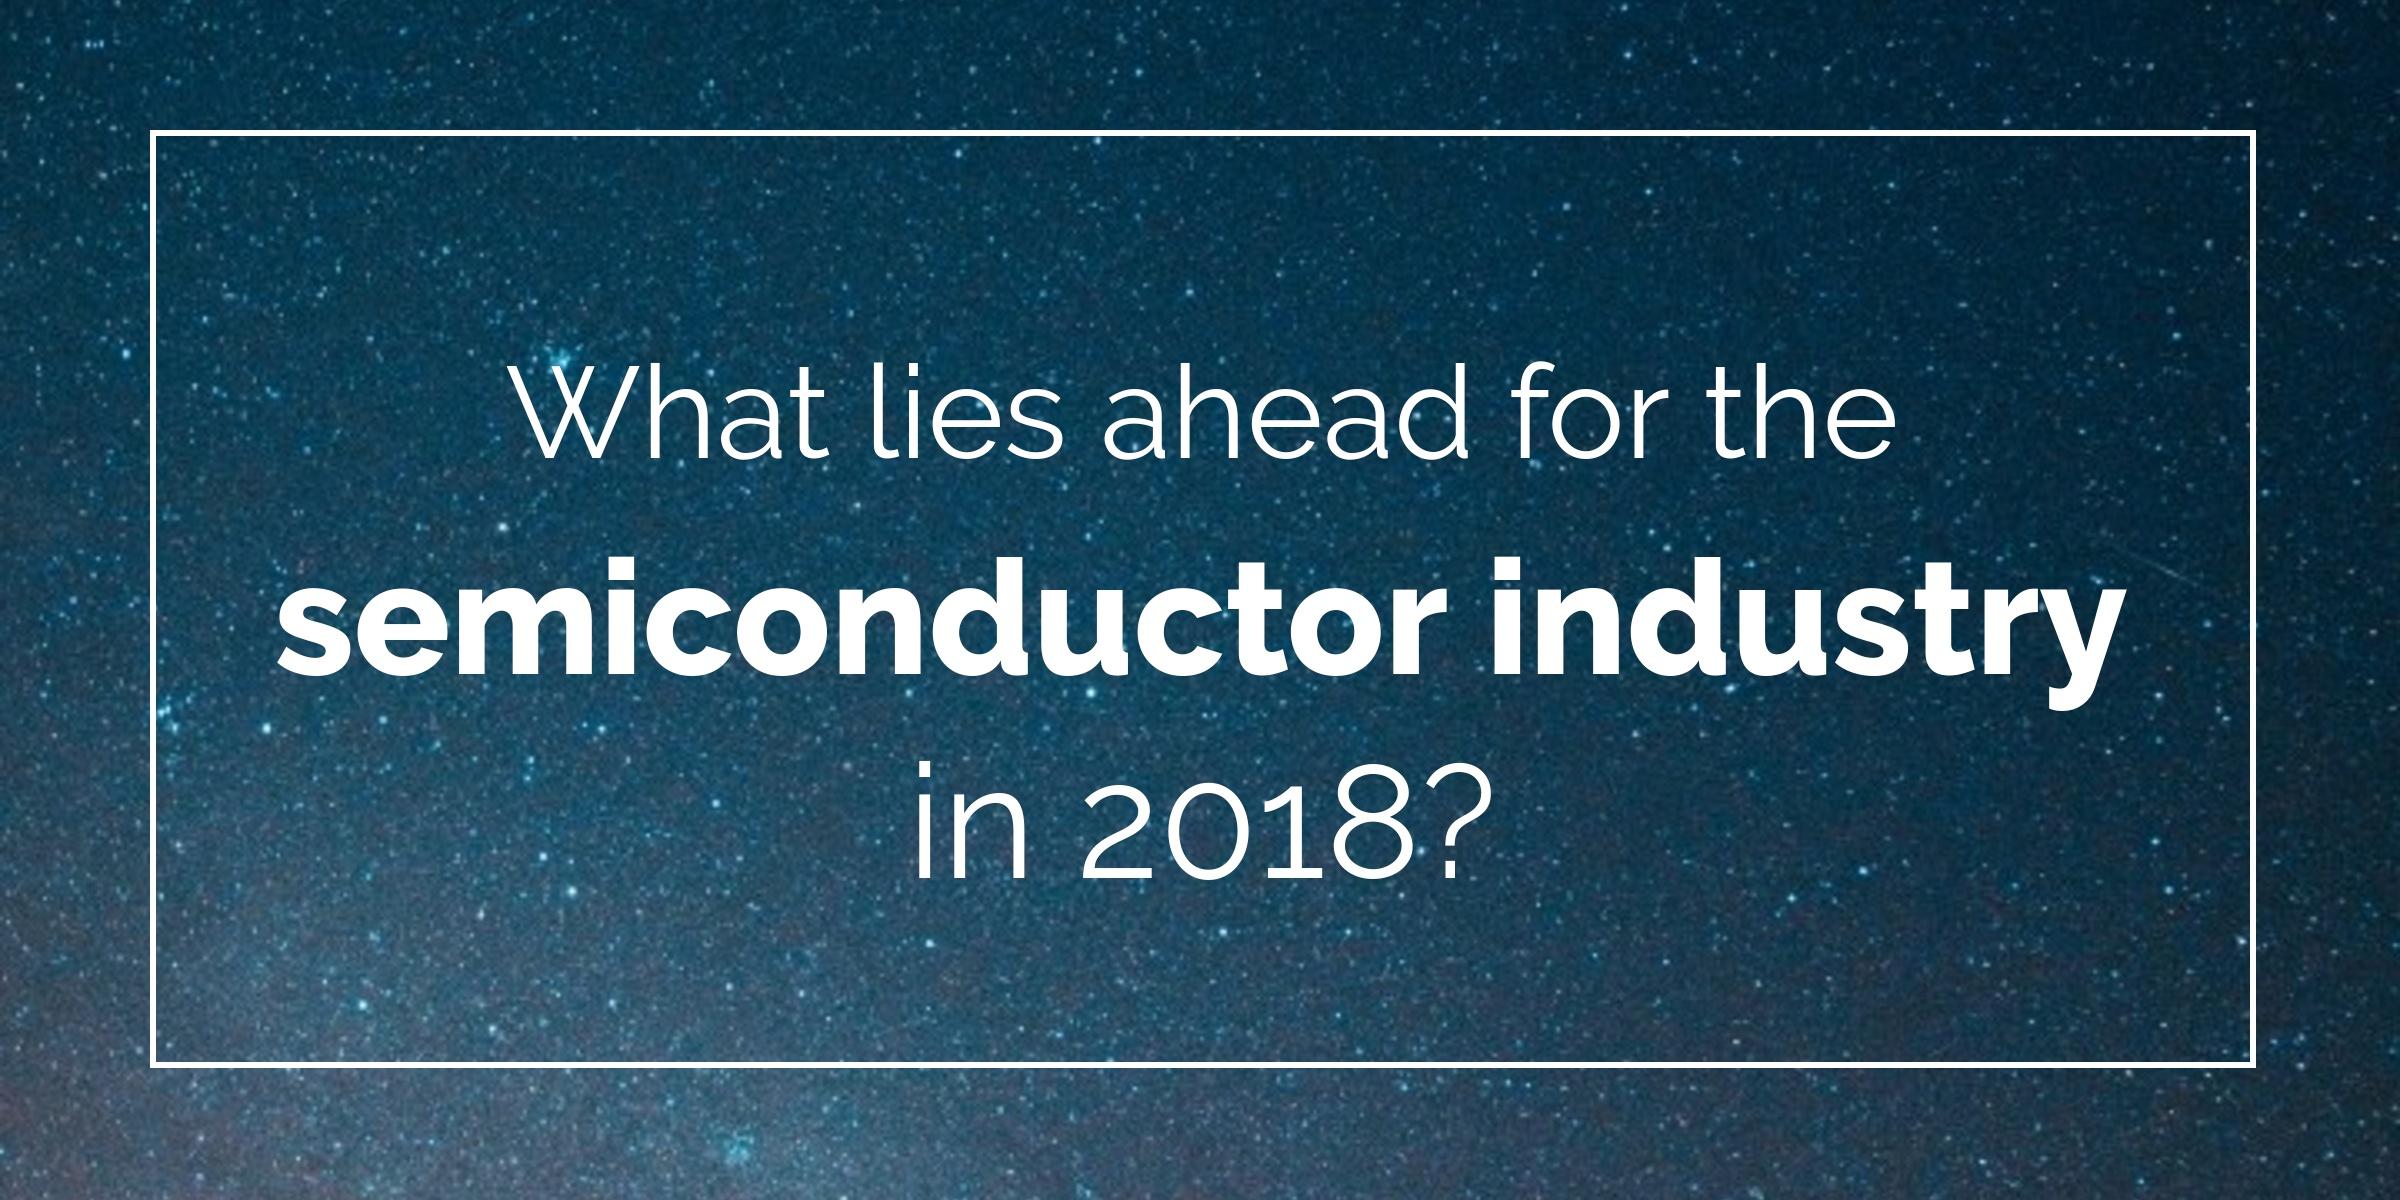 semiconductor-industry-in-2018.jpg